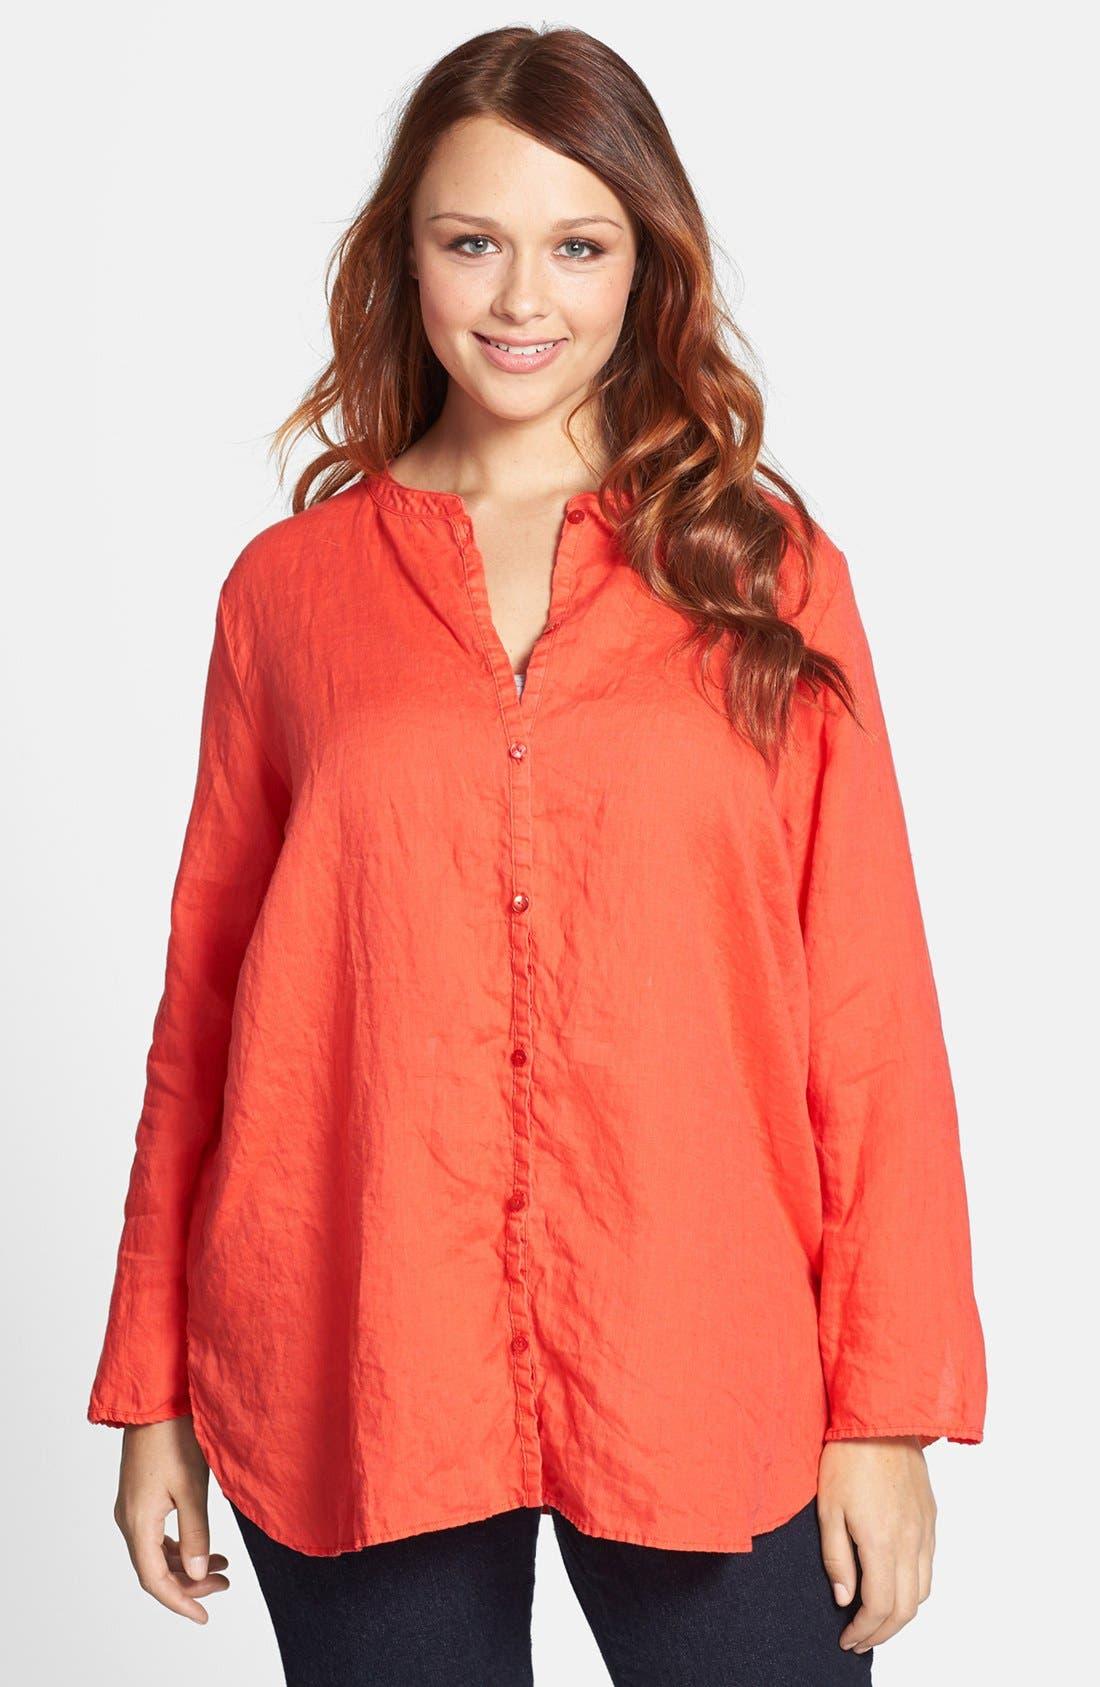 Alternate Image 1 Selected - Eileen Fisher Mandarin Collar Linen Shirt (Plus Size)